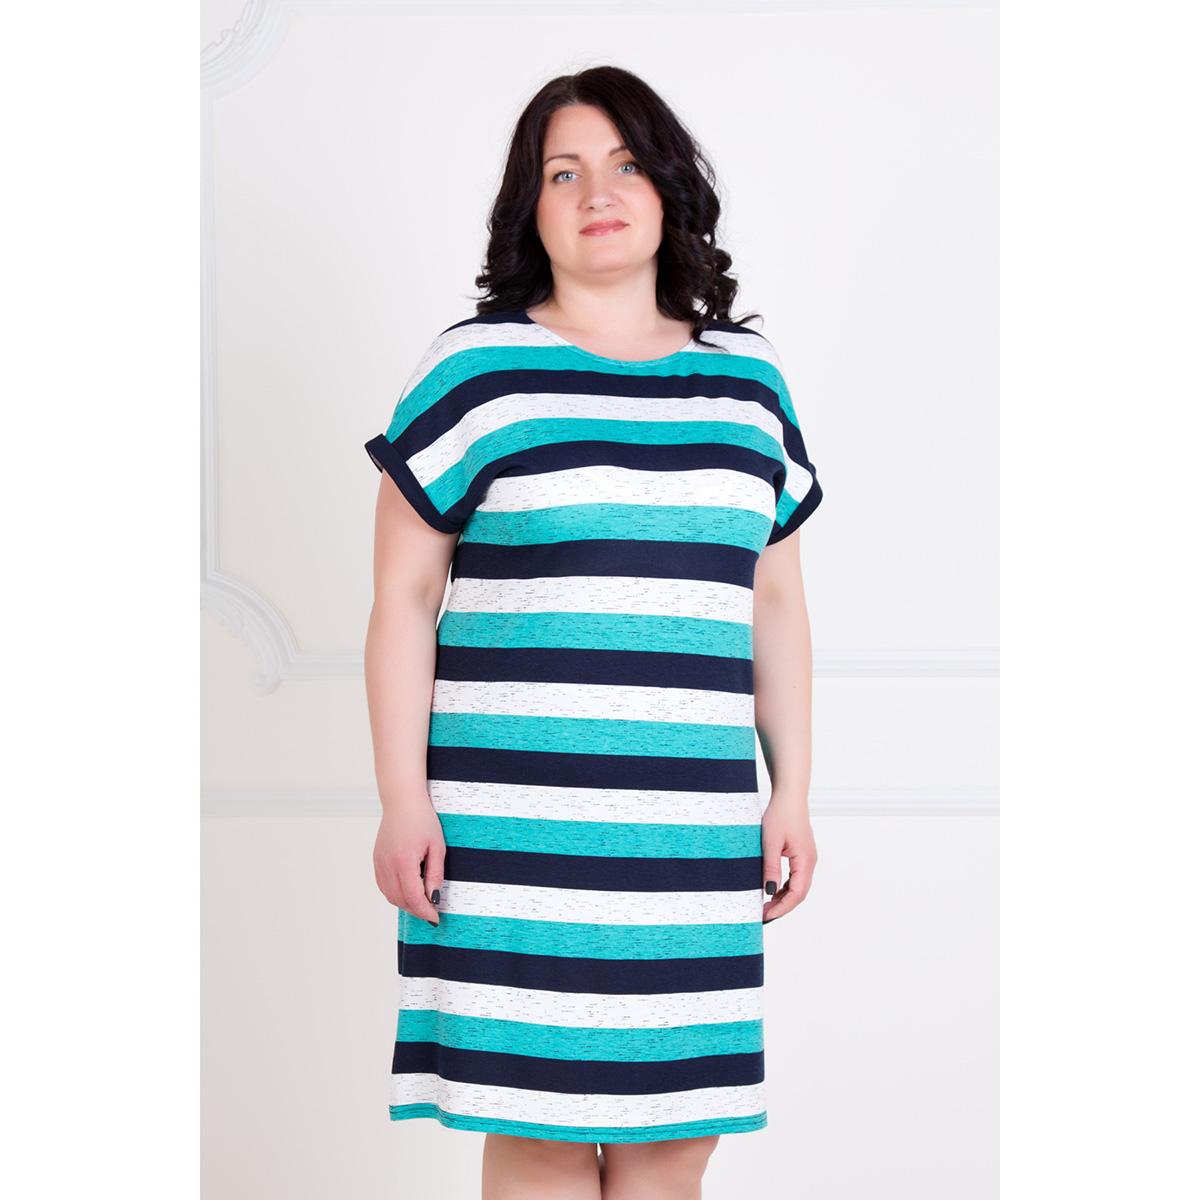 Жен. платье Ассоль р. 56Платья, туники<br>Обхват груди:112 см<br>Обхват талии:92 см<br>Обхват бедер:120 см<br>Длина по спинке:92 см<br>Рост:167 см<br><br>Тип: Жен. платье<br>Размер: 56<br>Материал: Вискоза